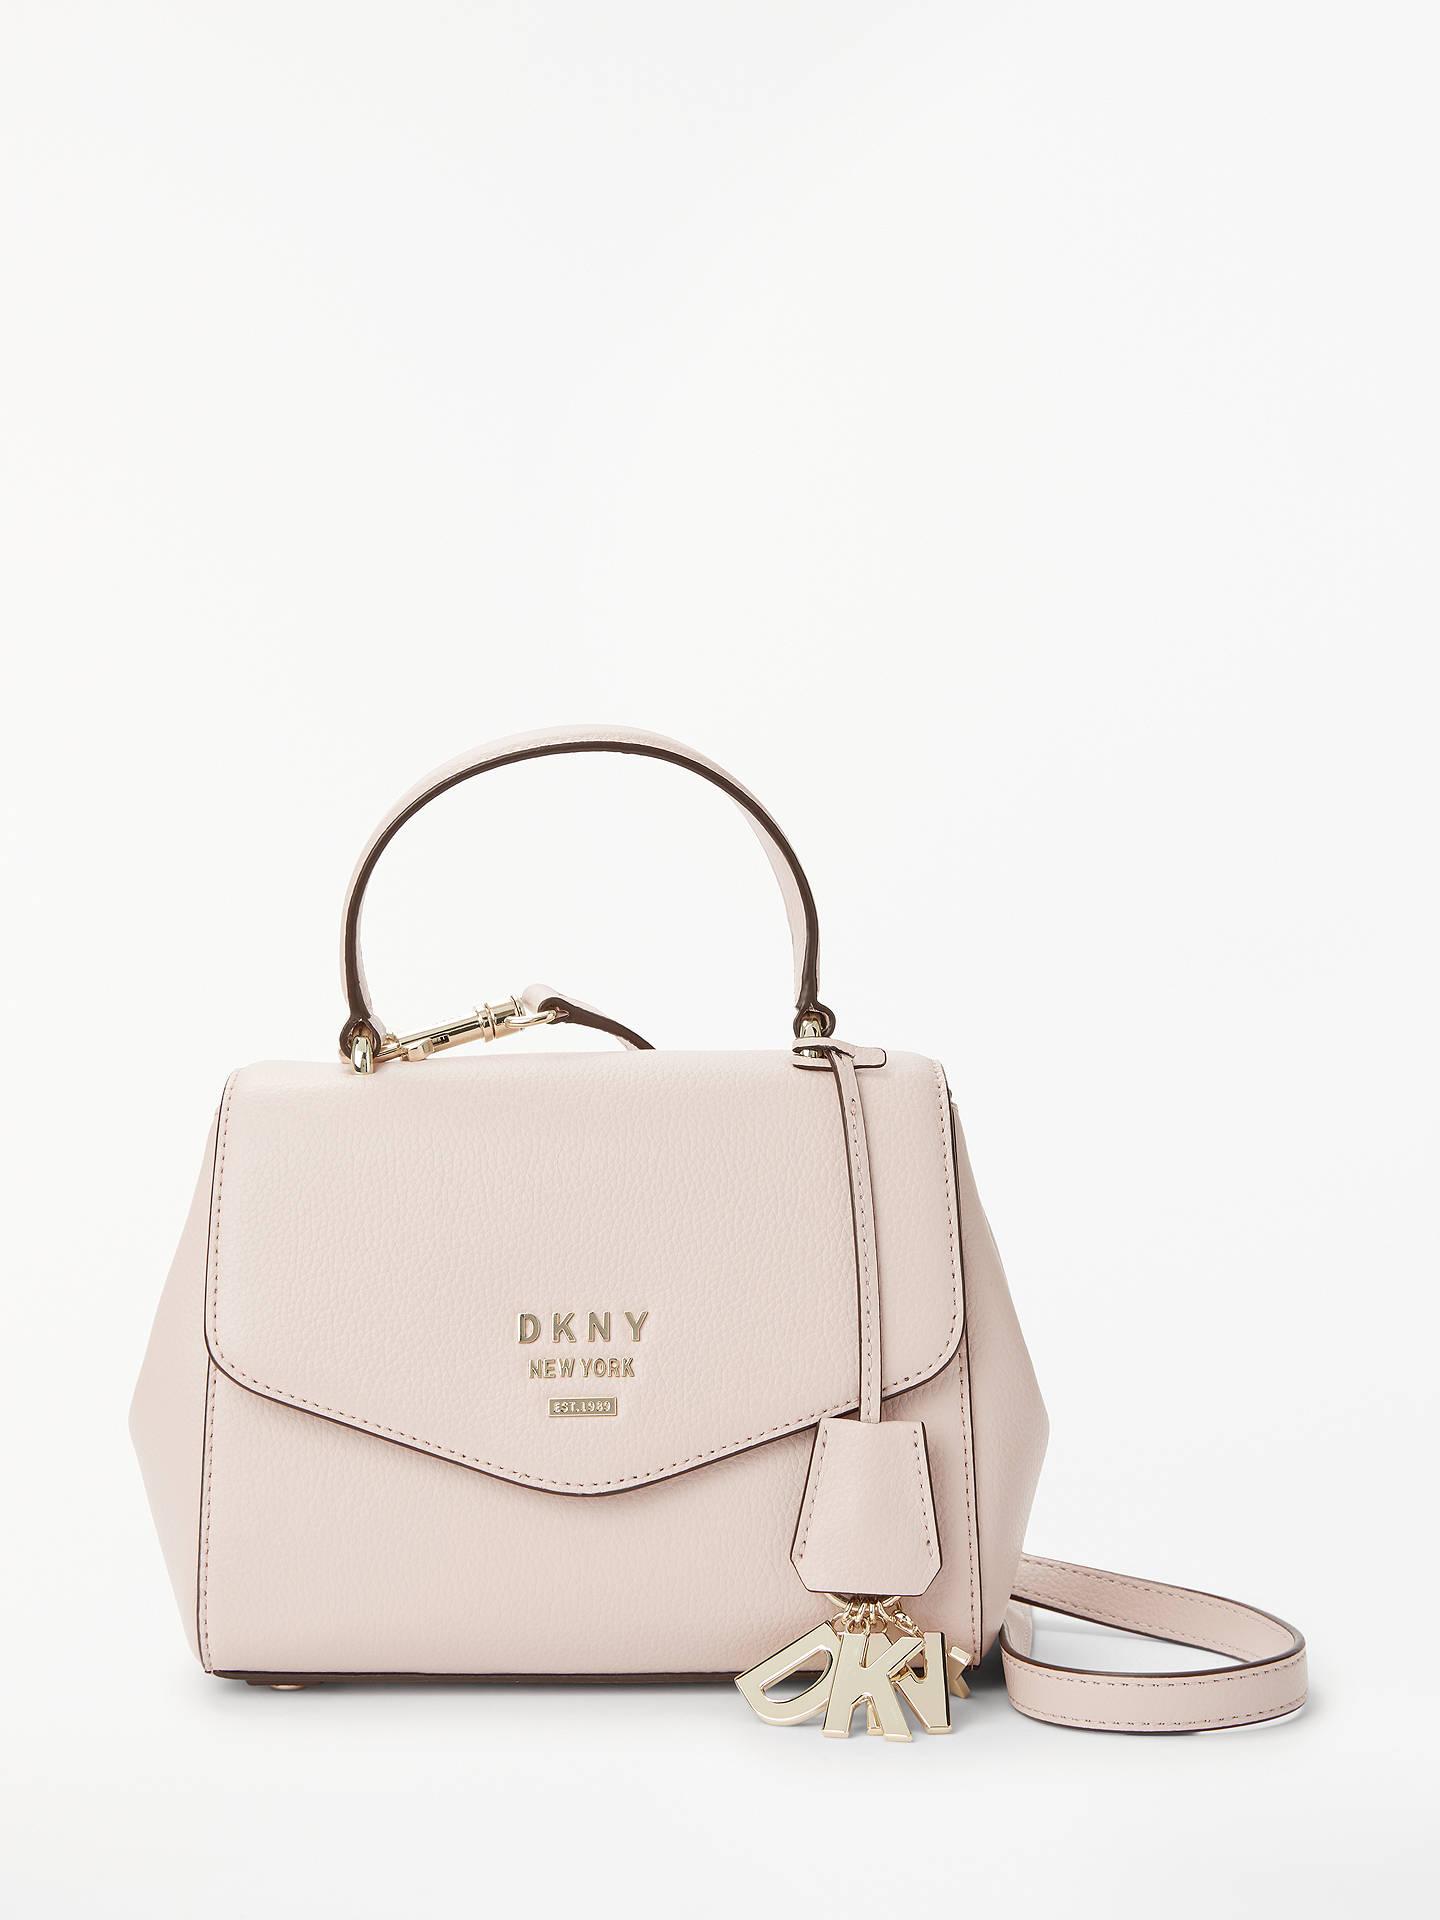 BuyDKNY Hutton Medium Leather Satchel Bag 40a1158d584e9